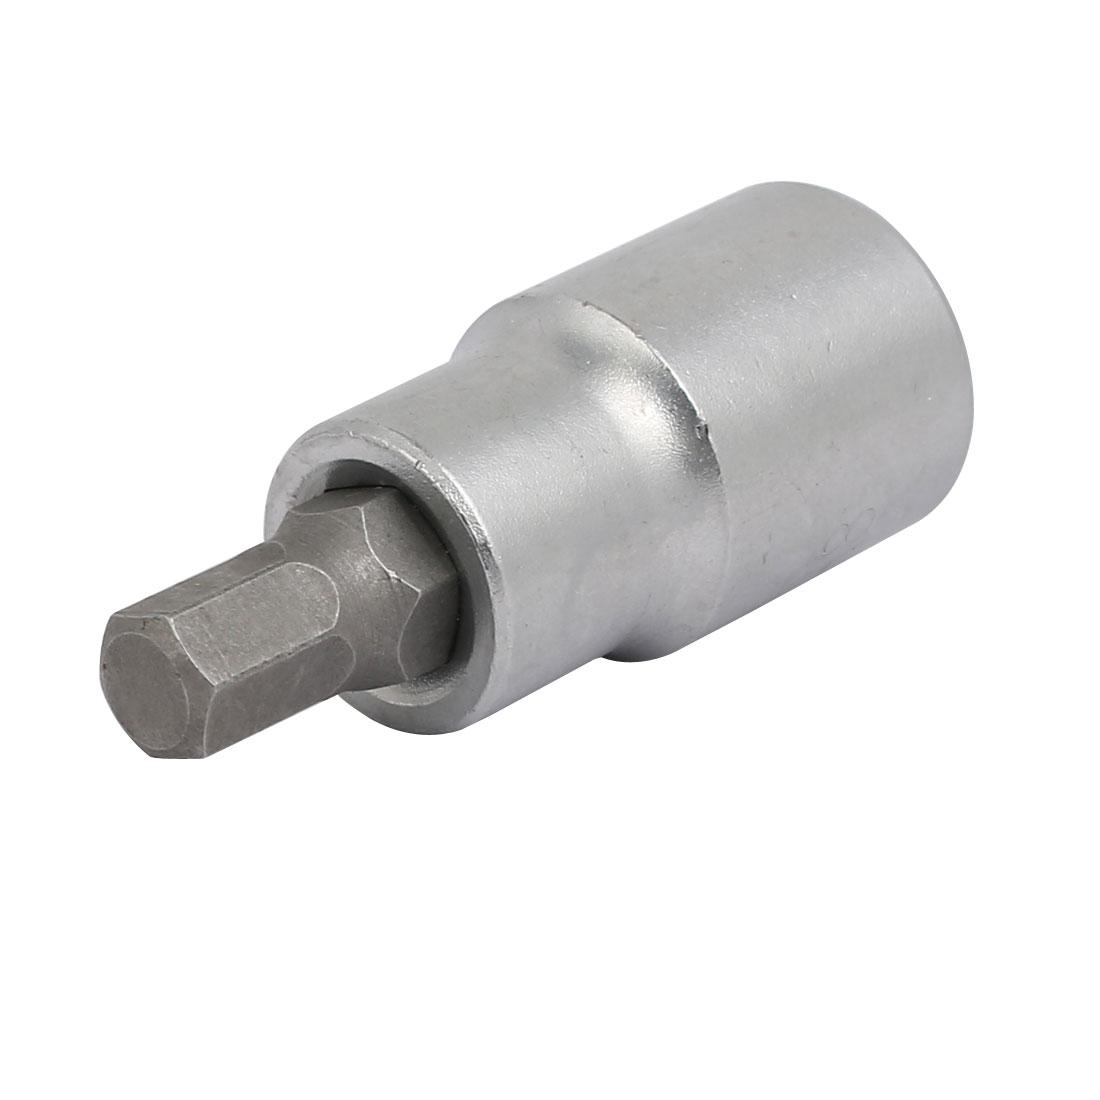 H8 Hex Head 54mm Long 1/2-inch Square Drive Cr-V Impact Socket